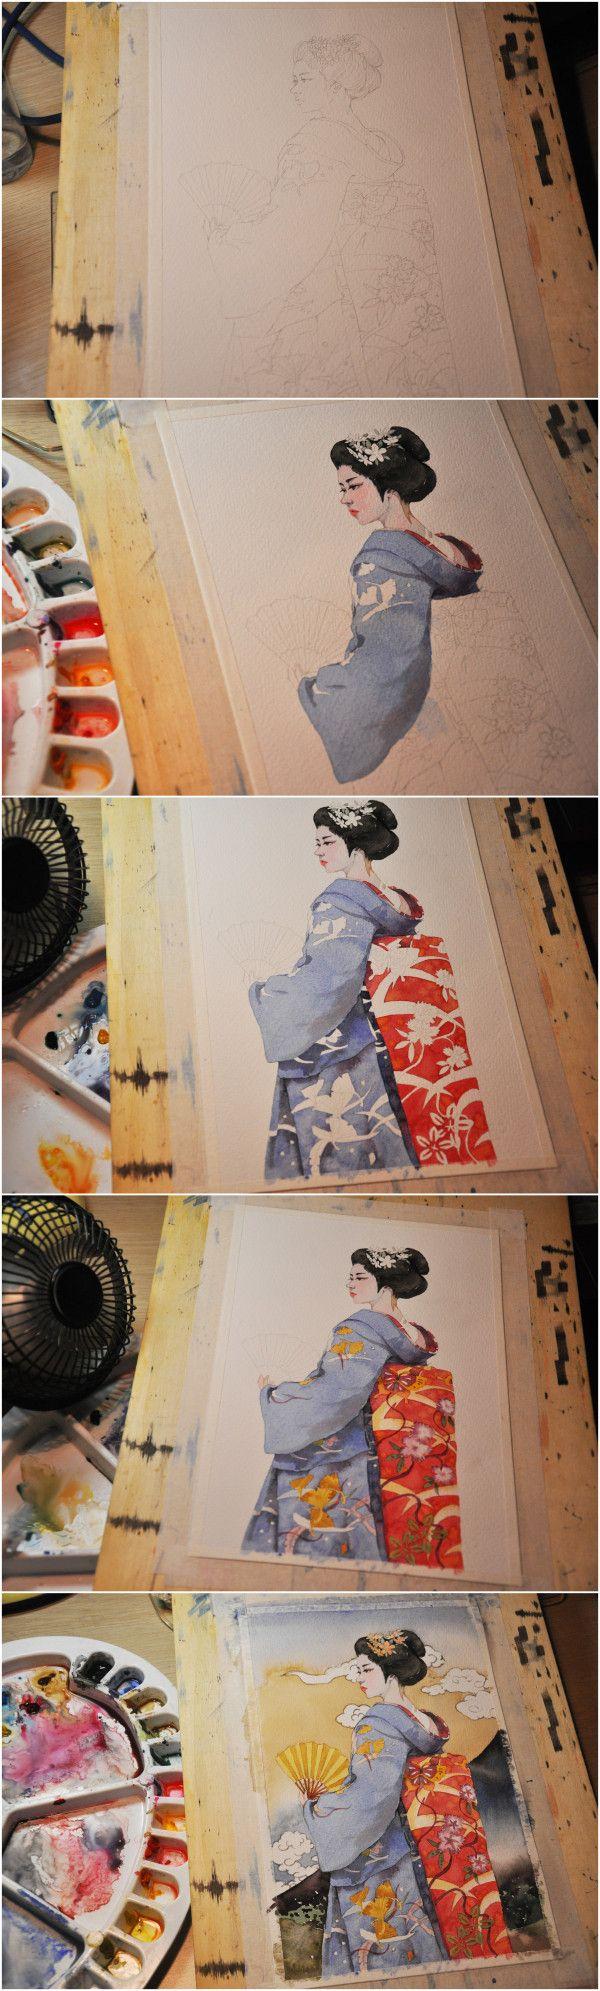 Watercolor - Ah jimmy__ Graffiti Kingdom illustrator